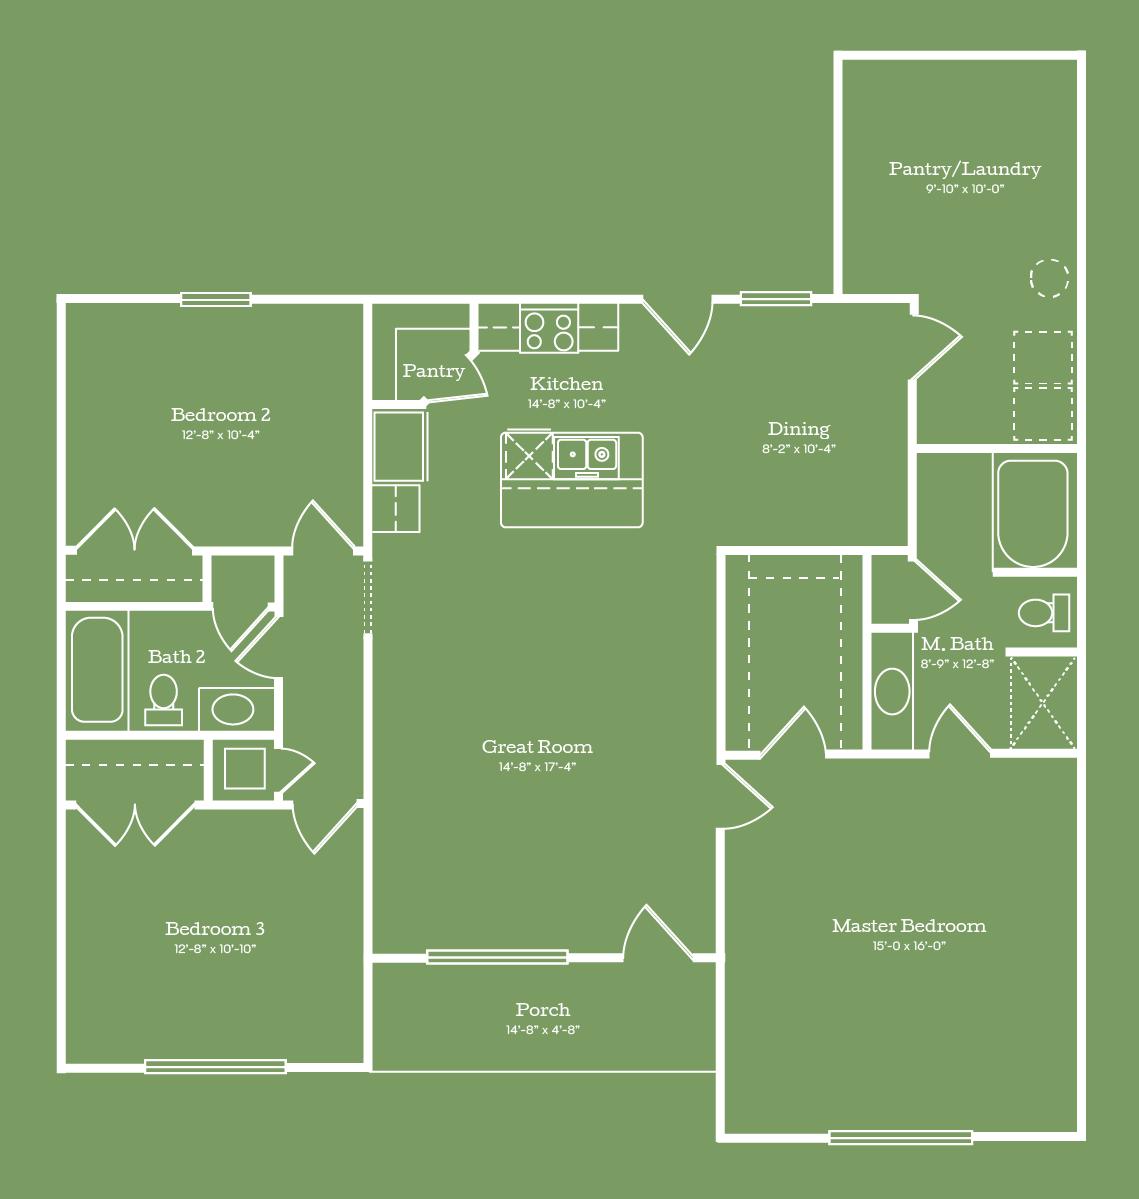 The Houston Floor Plan